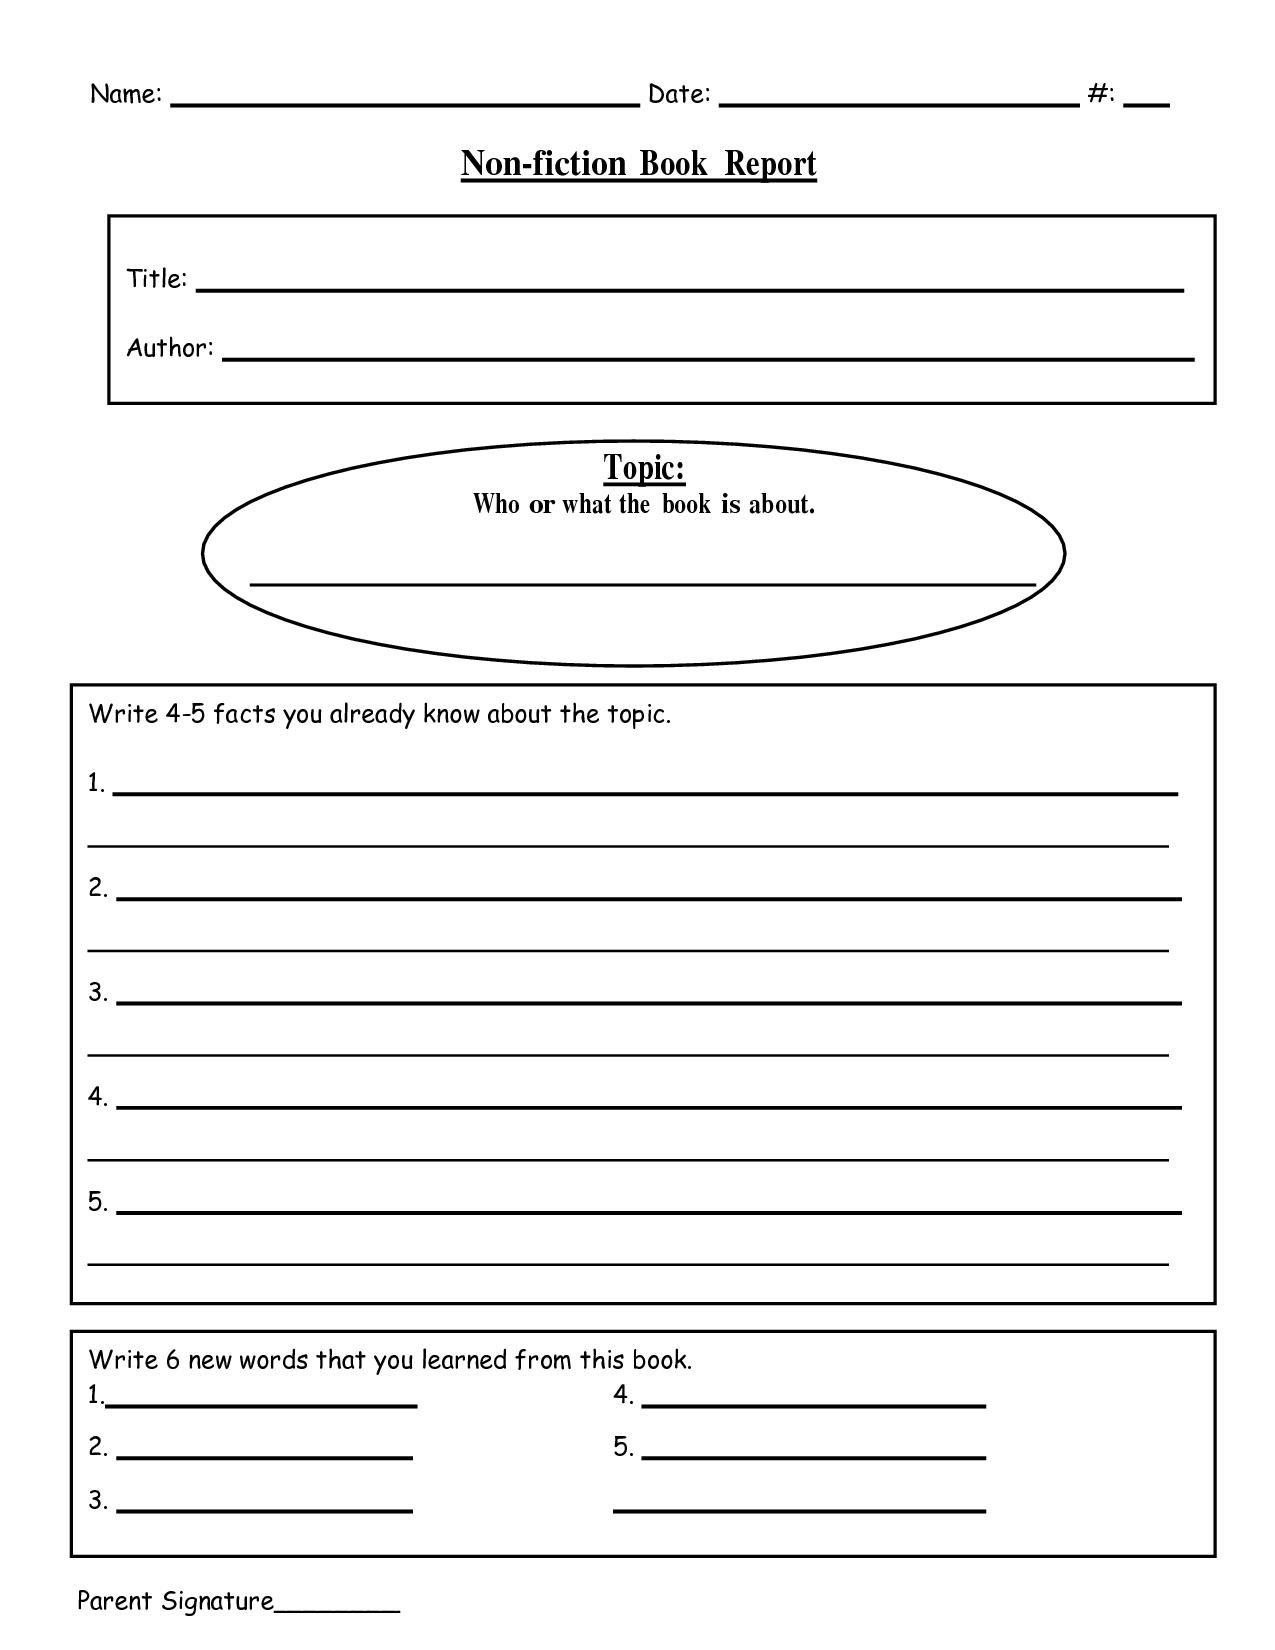 Free Printable Book Report Templates  Nonfiction Book Reportdoc Inside Report Writing Template Free